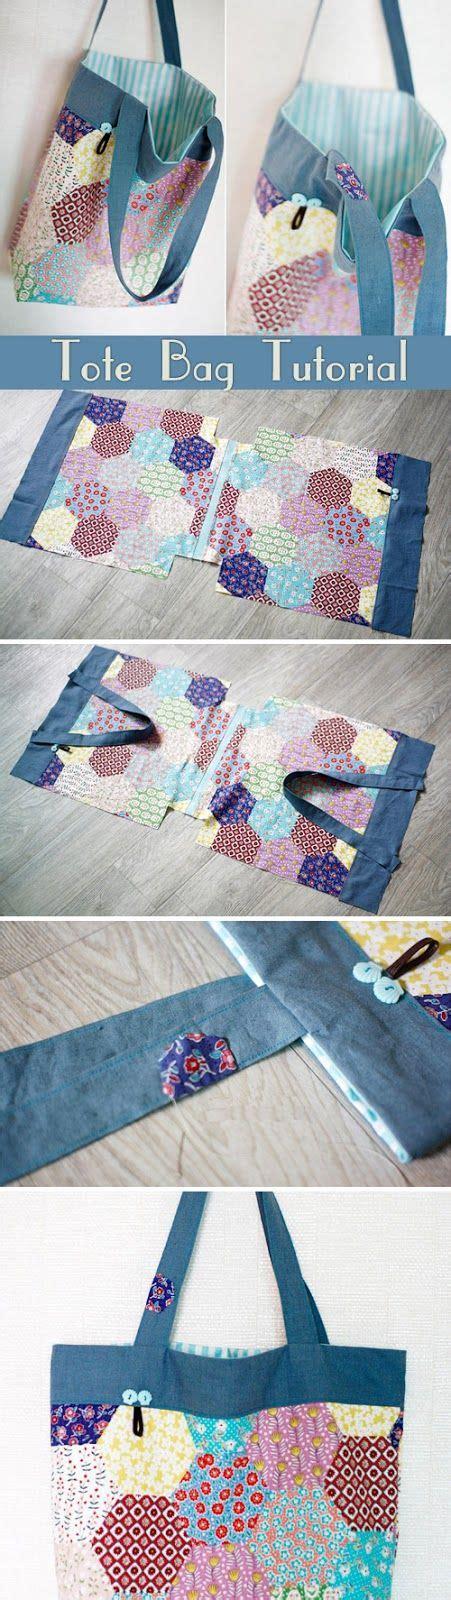 Handmade Bag Tutorial Free - 2766 best handmade handbags images on